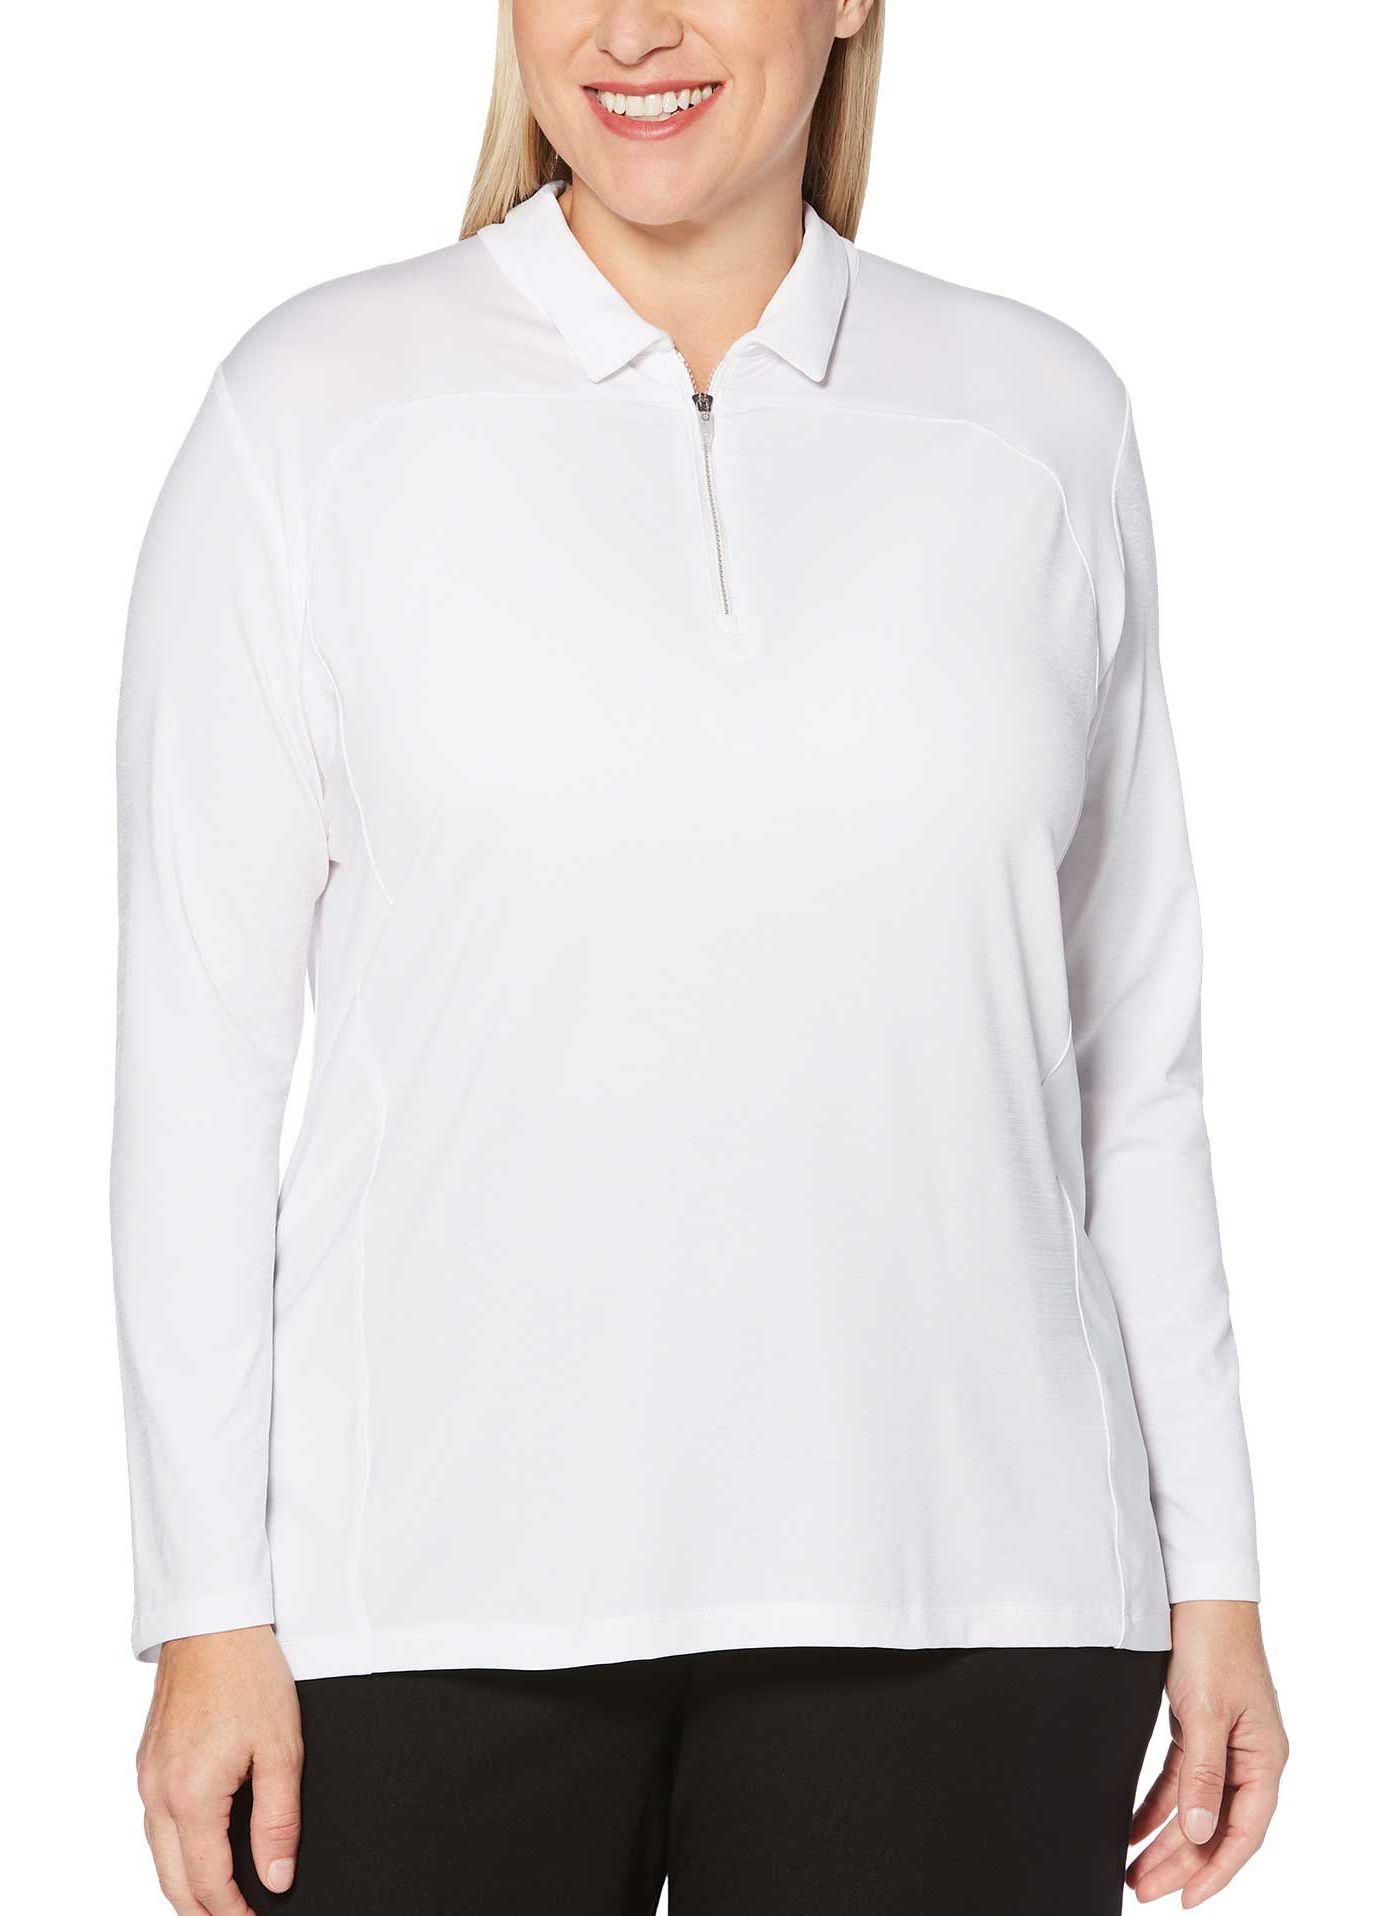 Callaway Women's ¼-Zip Long Sleeve Golf Polo - Extended Sizes